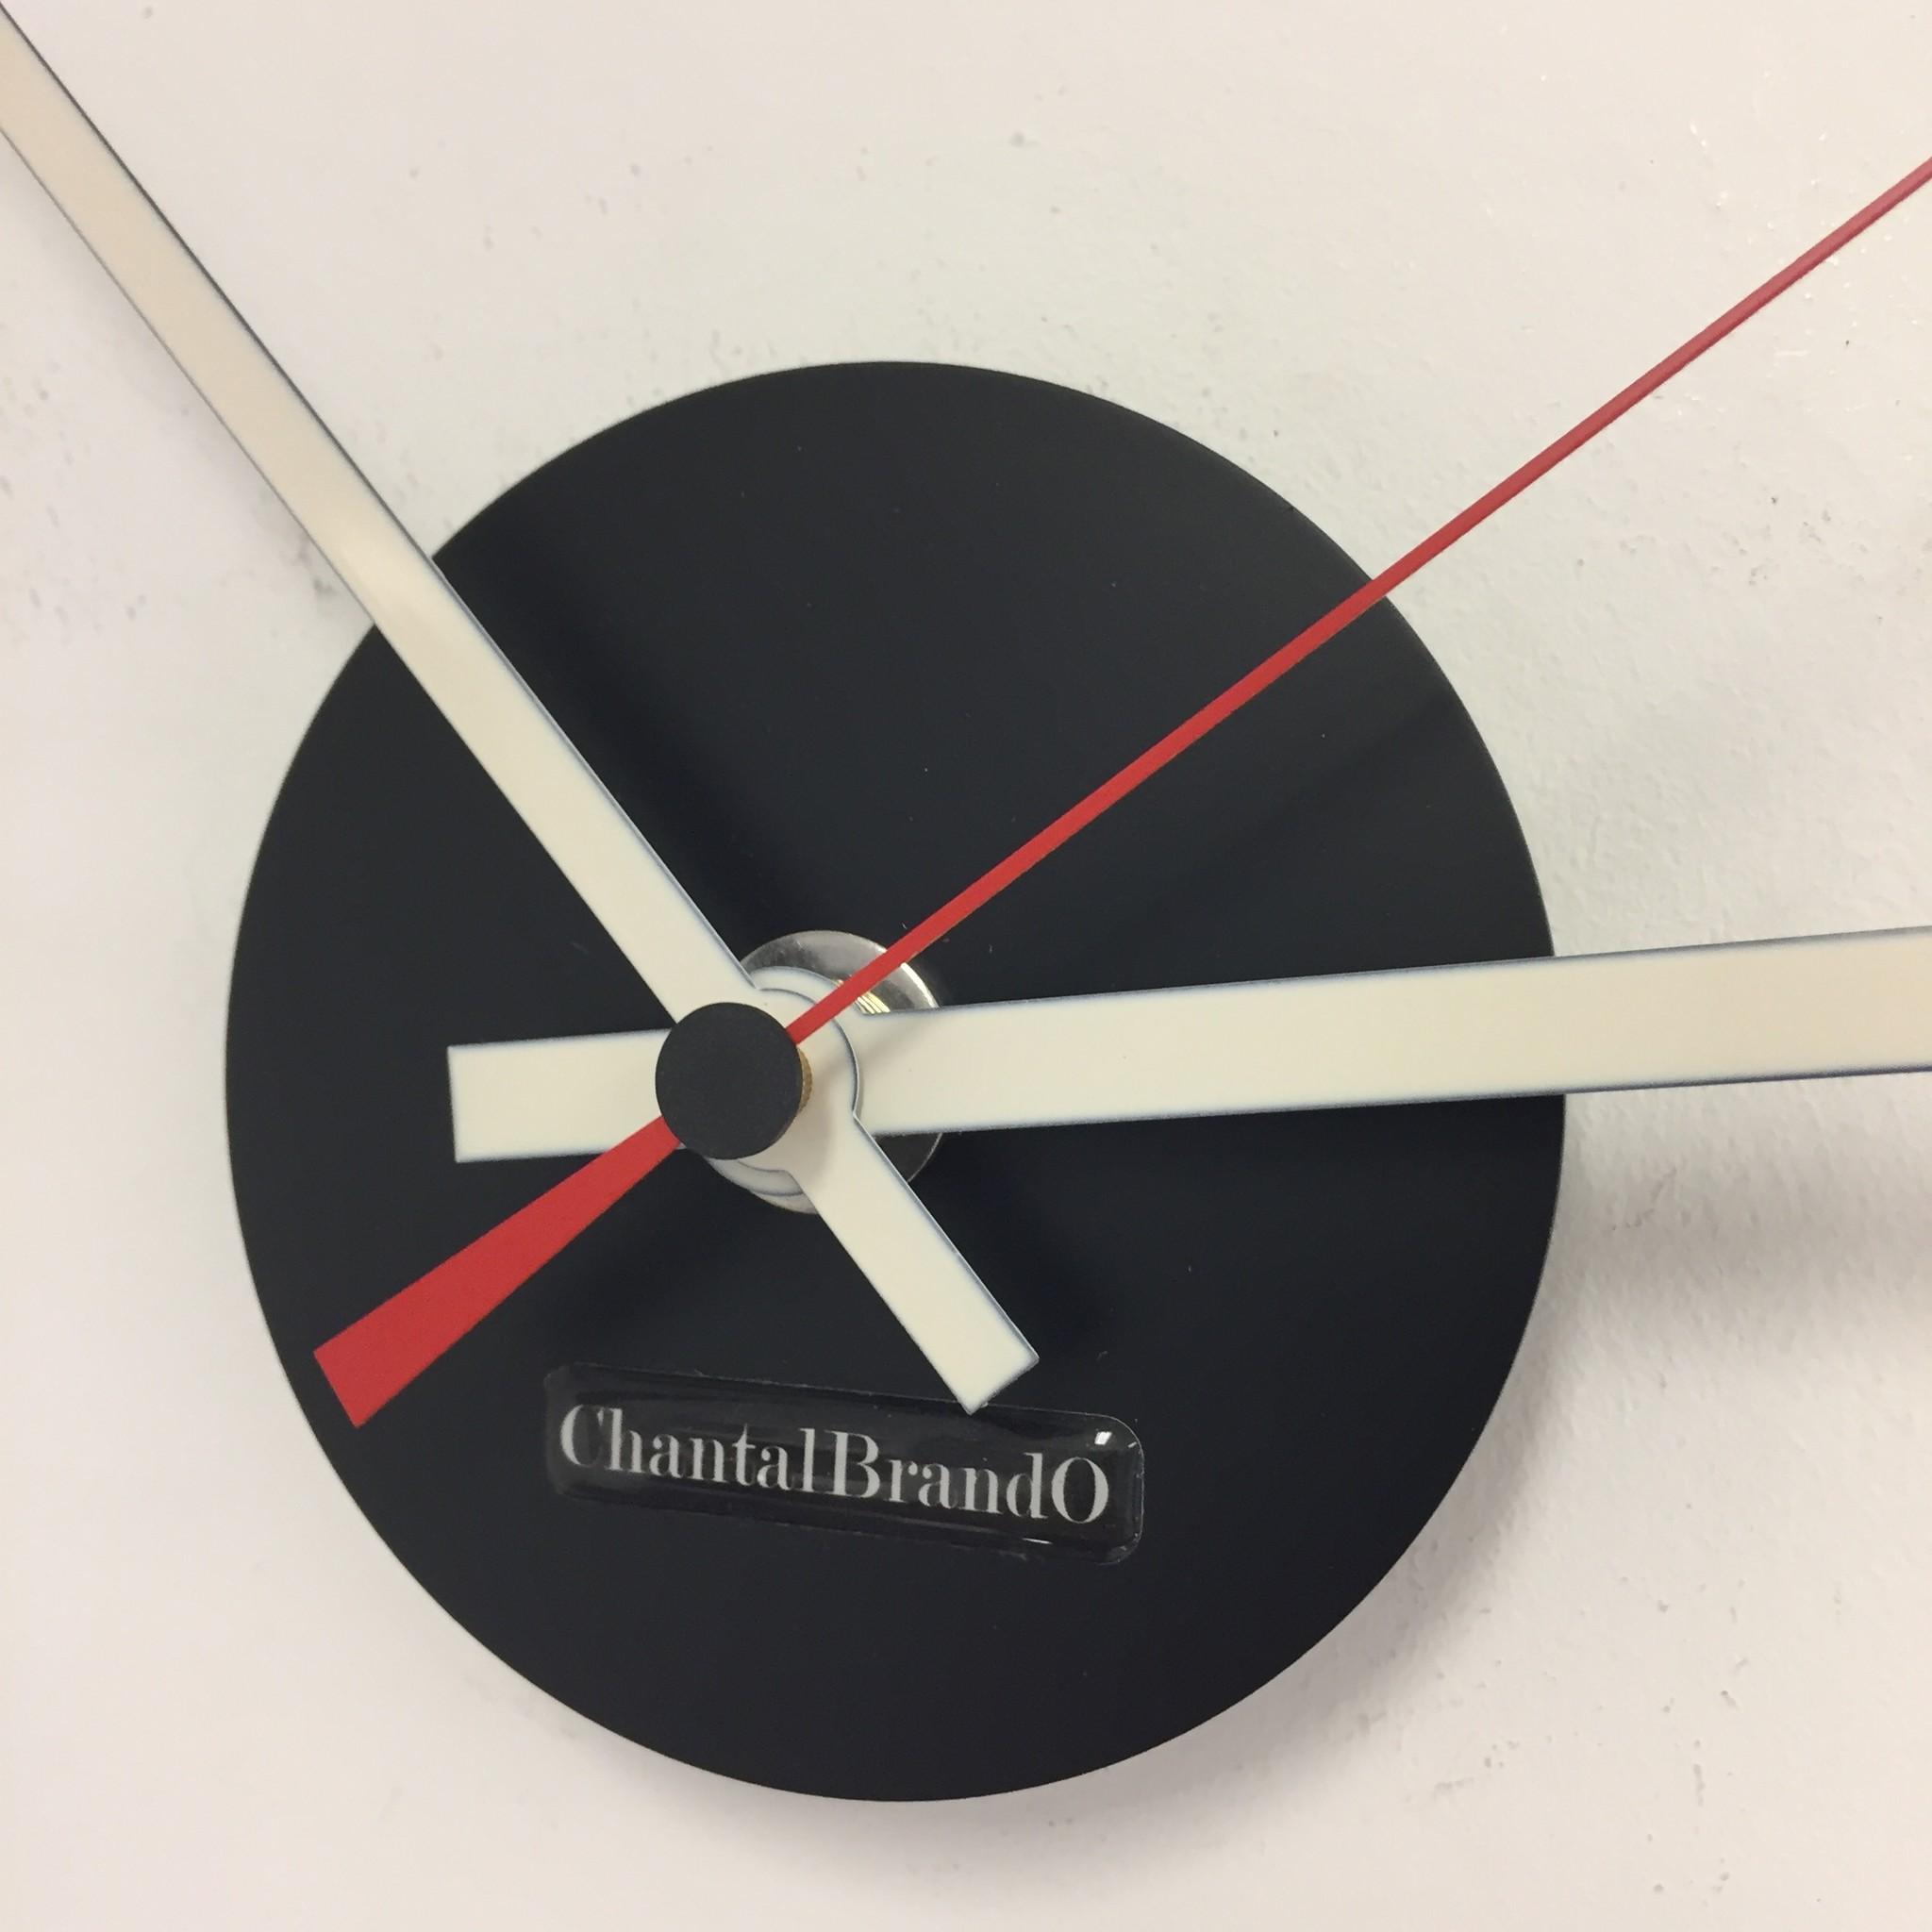 ChantalBrandO Wandklok MINI 7 CHANTALBRANDO DUTCH DESIGN